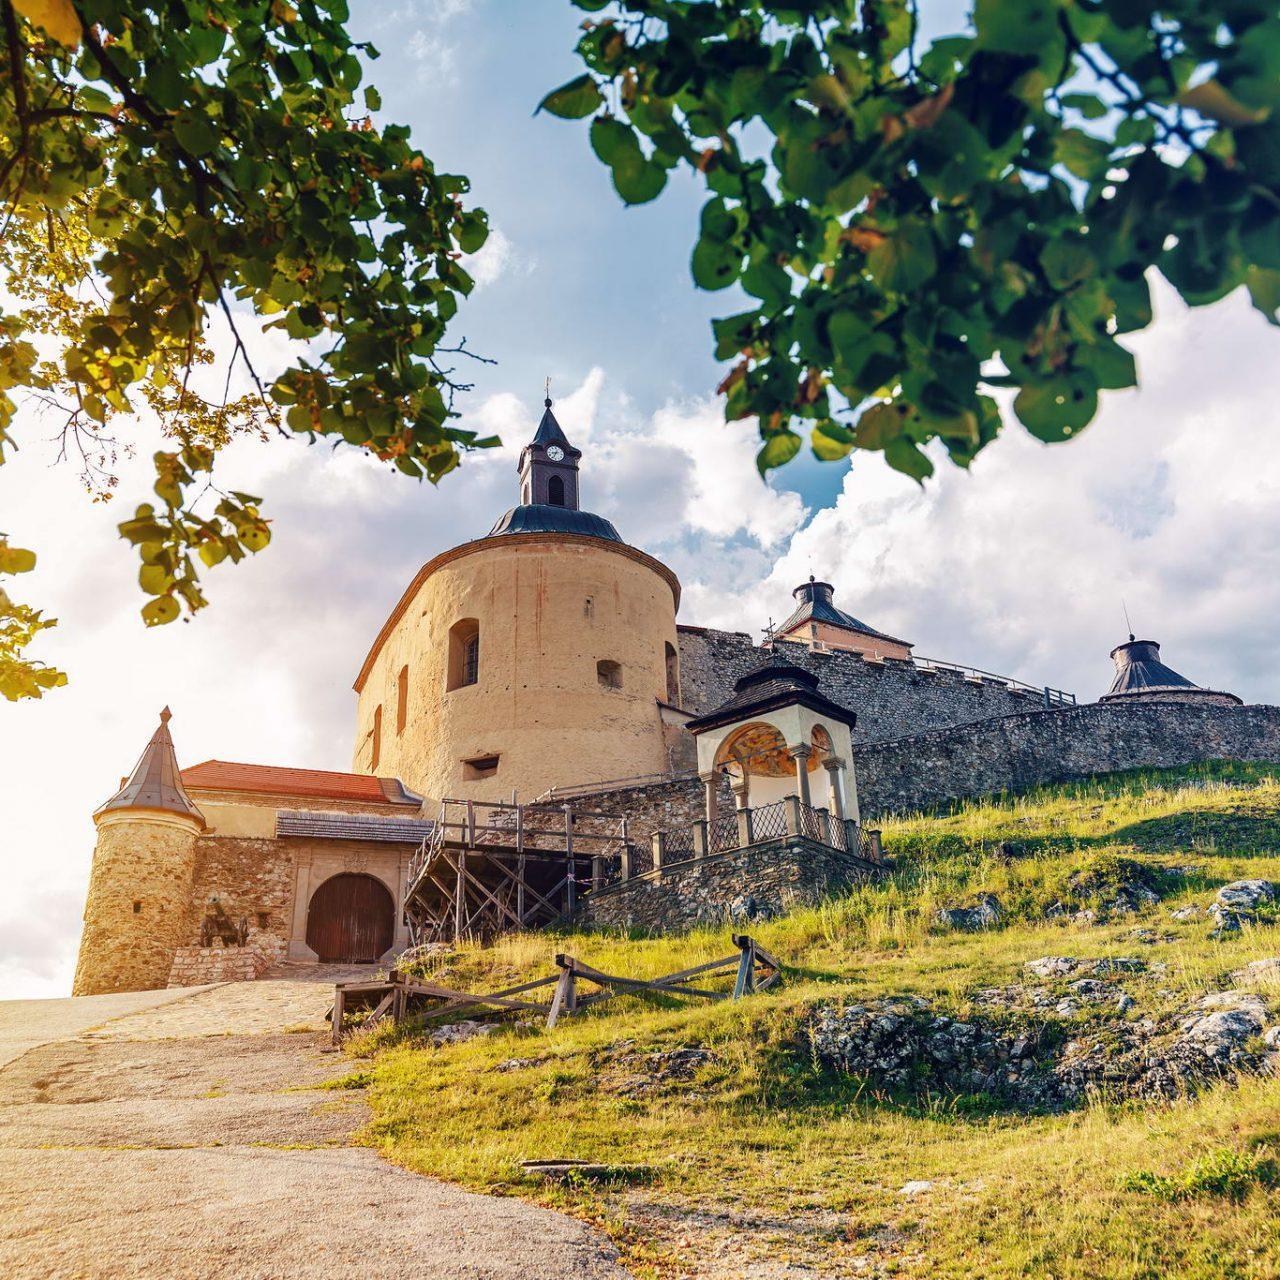 https://www.bestslovakiatours.com/wp-content/uploads/2021/09/krasna-horka-castle-slovakia-V38DS2L_resize-1280x1280-1.jpg